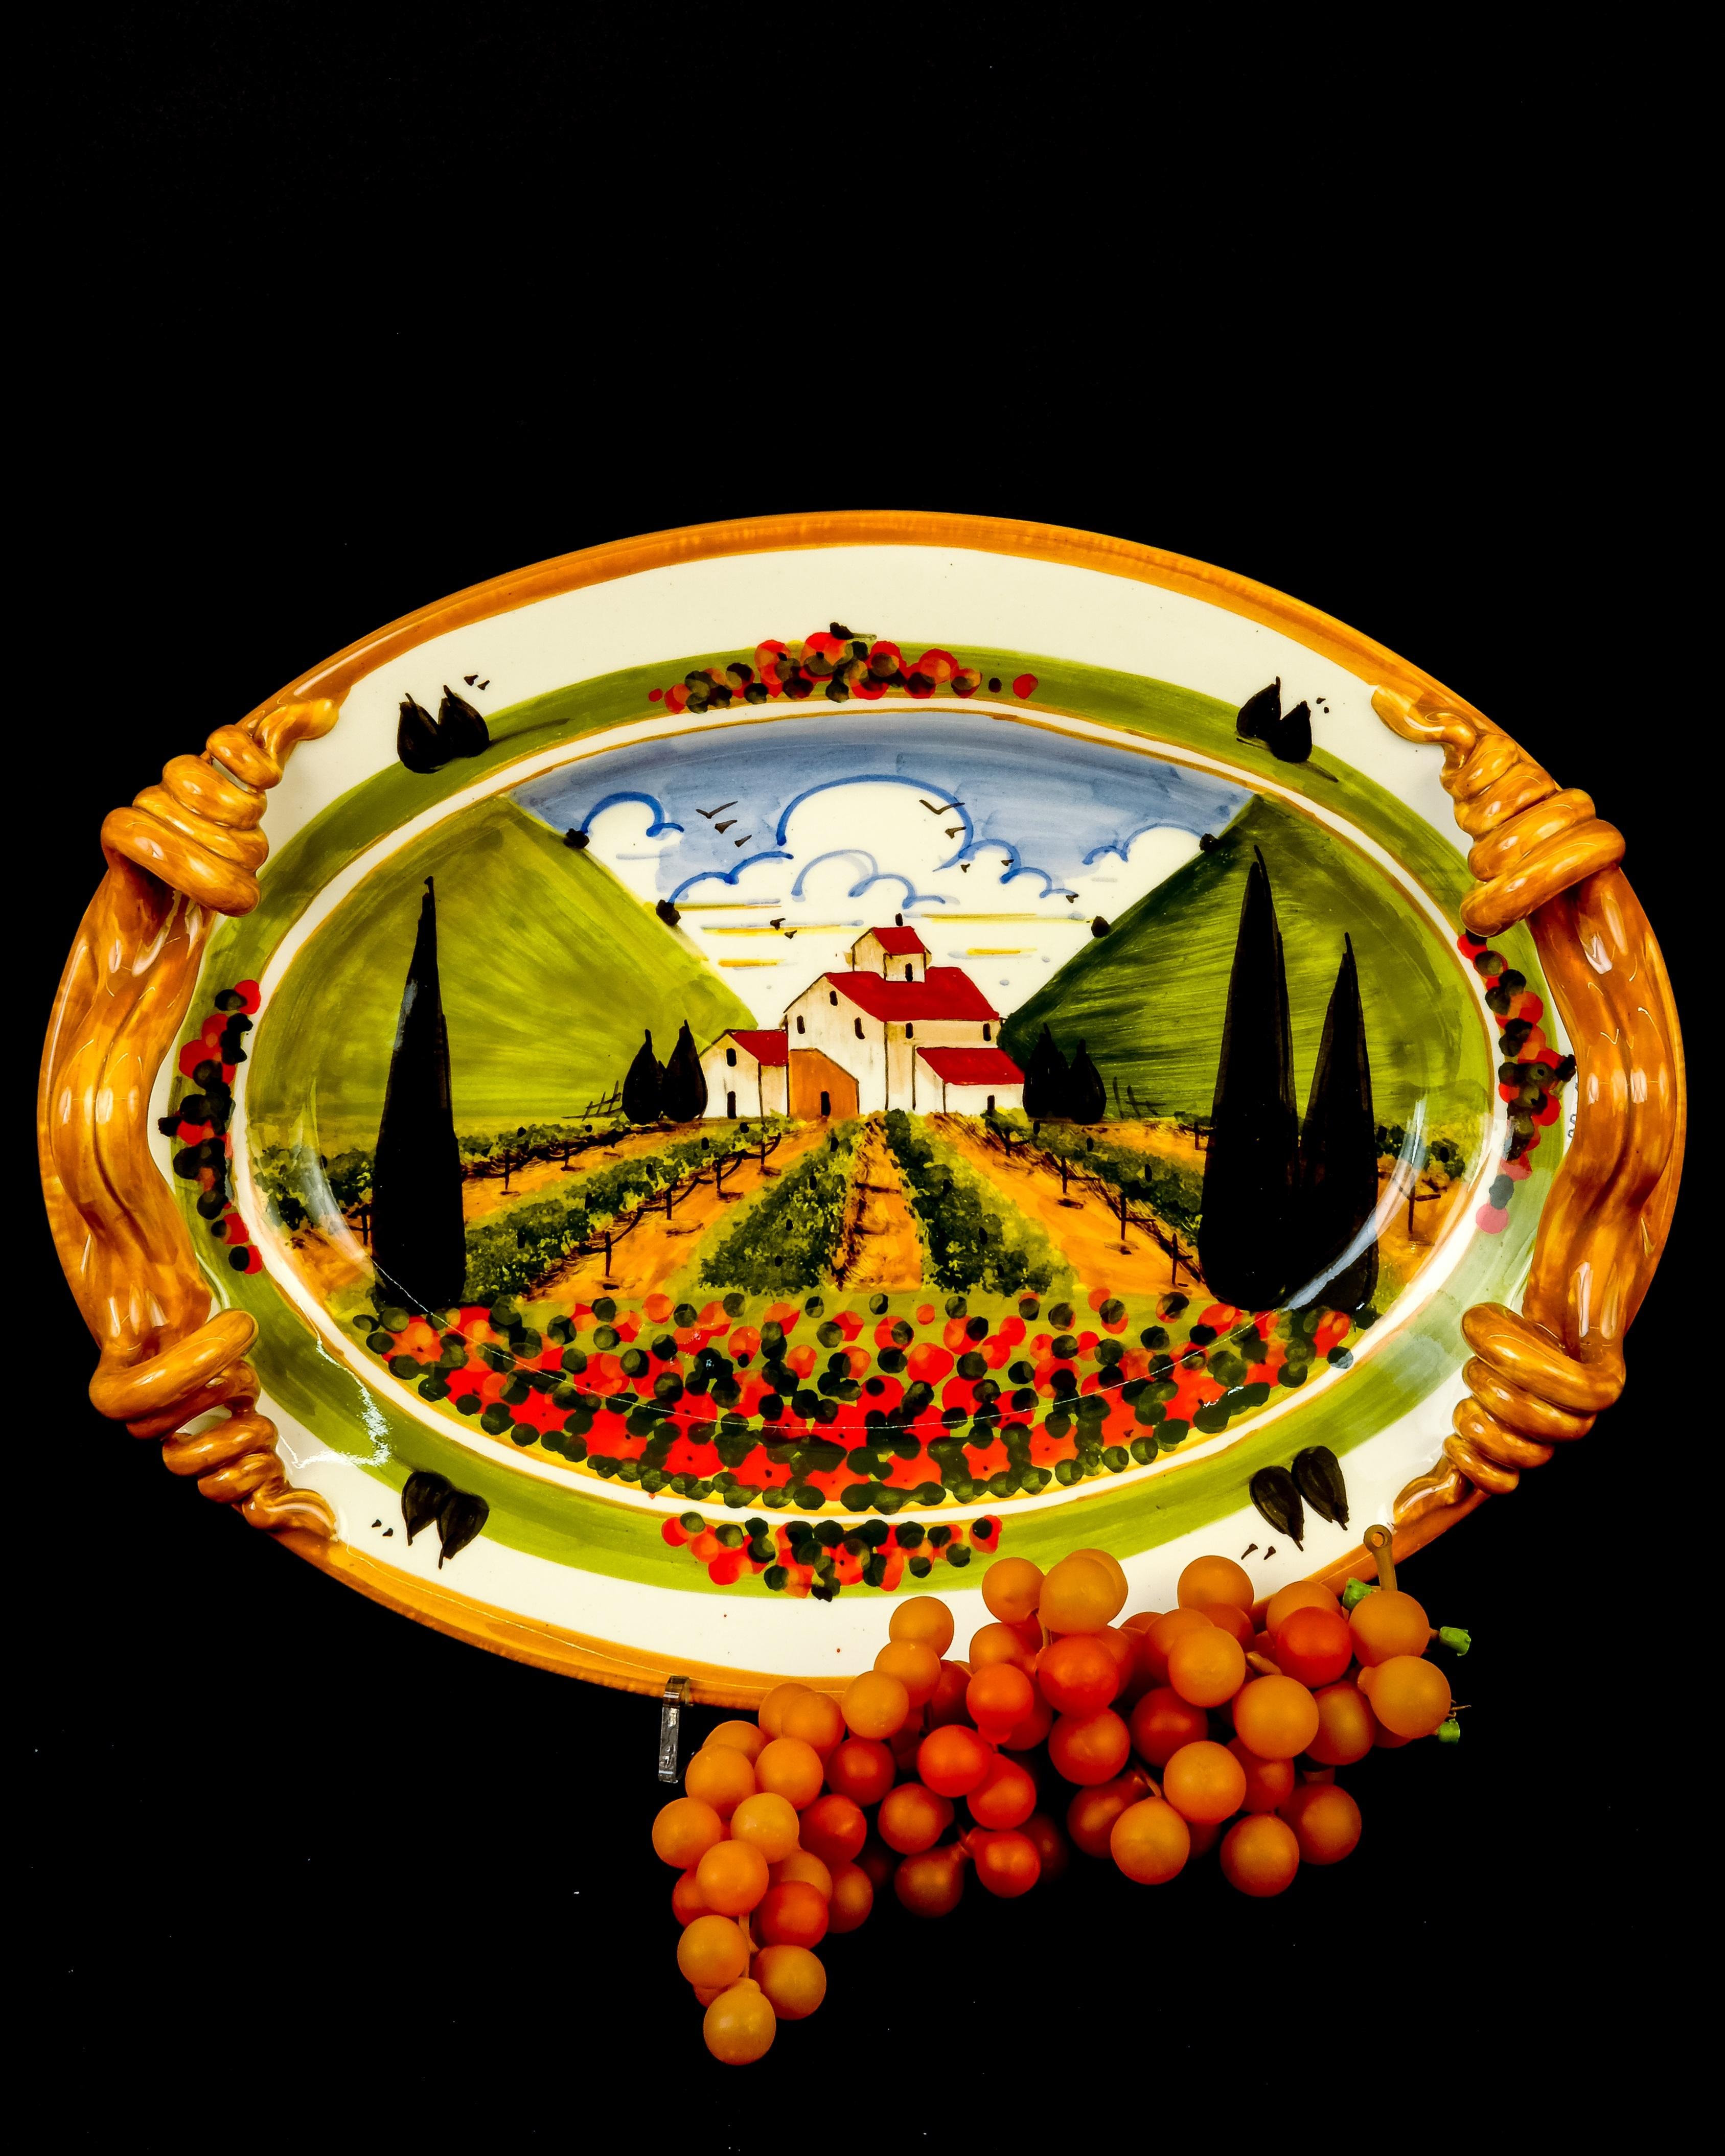 Paesaggi Toscani - <p>Vieni a vederli!</p>